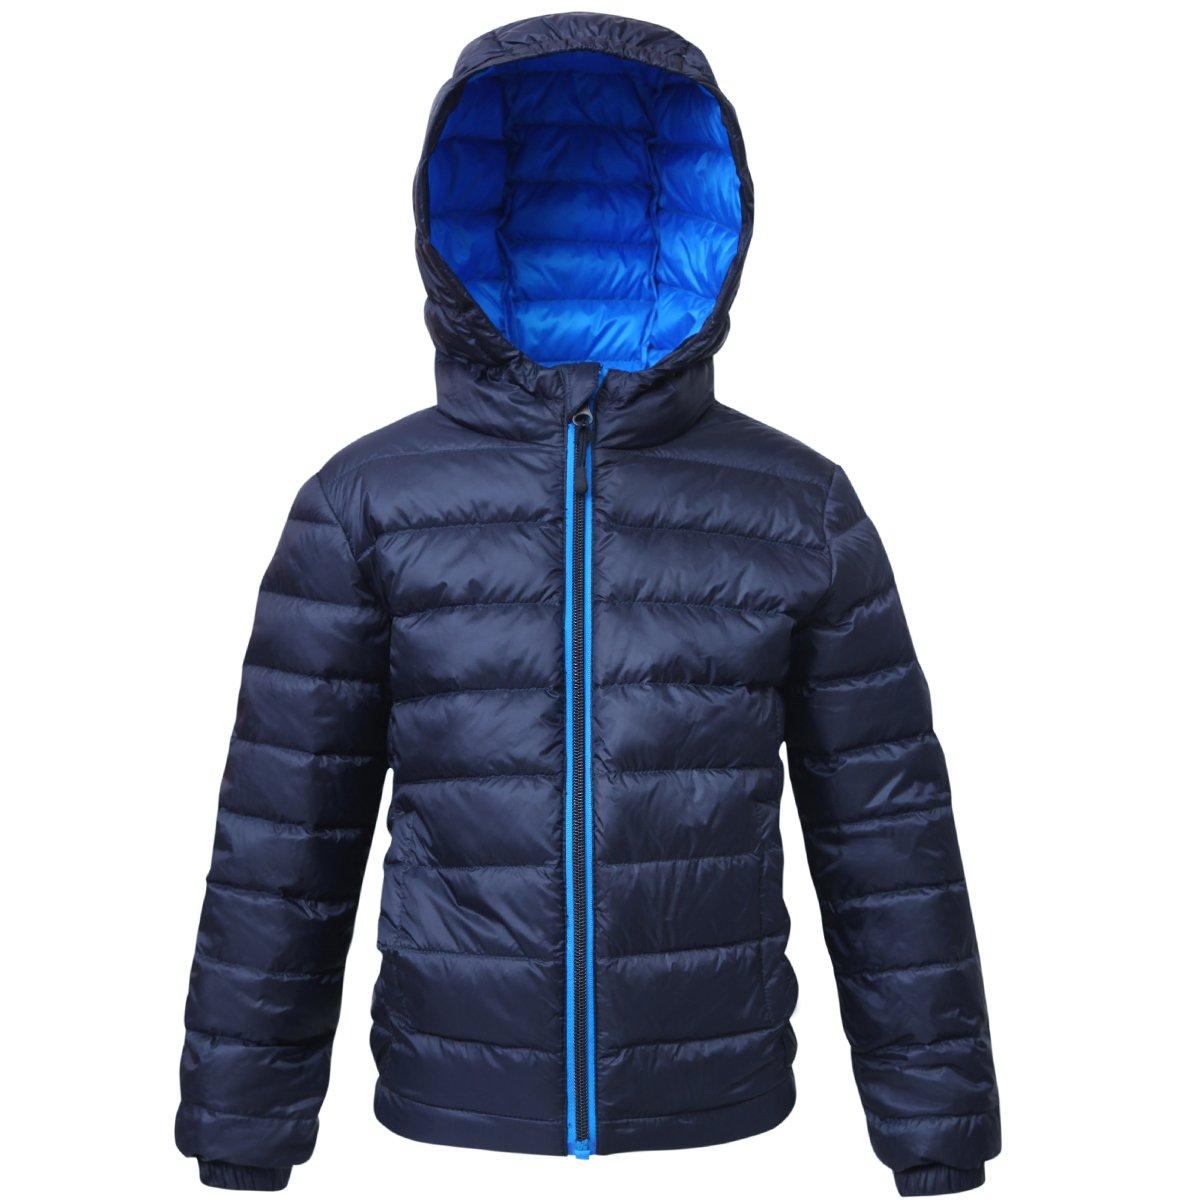 Rokka&Rolla Boys' Ultra Lightweight Hooded Packable Puffer Down Jacket (S (6/7), Night Sky)